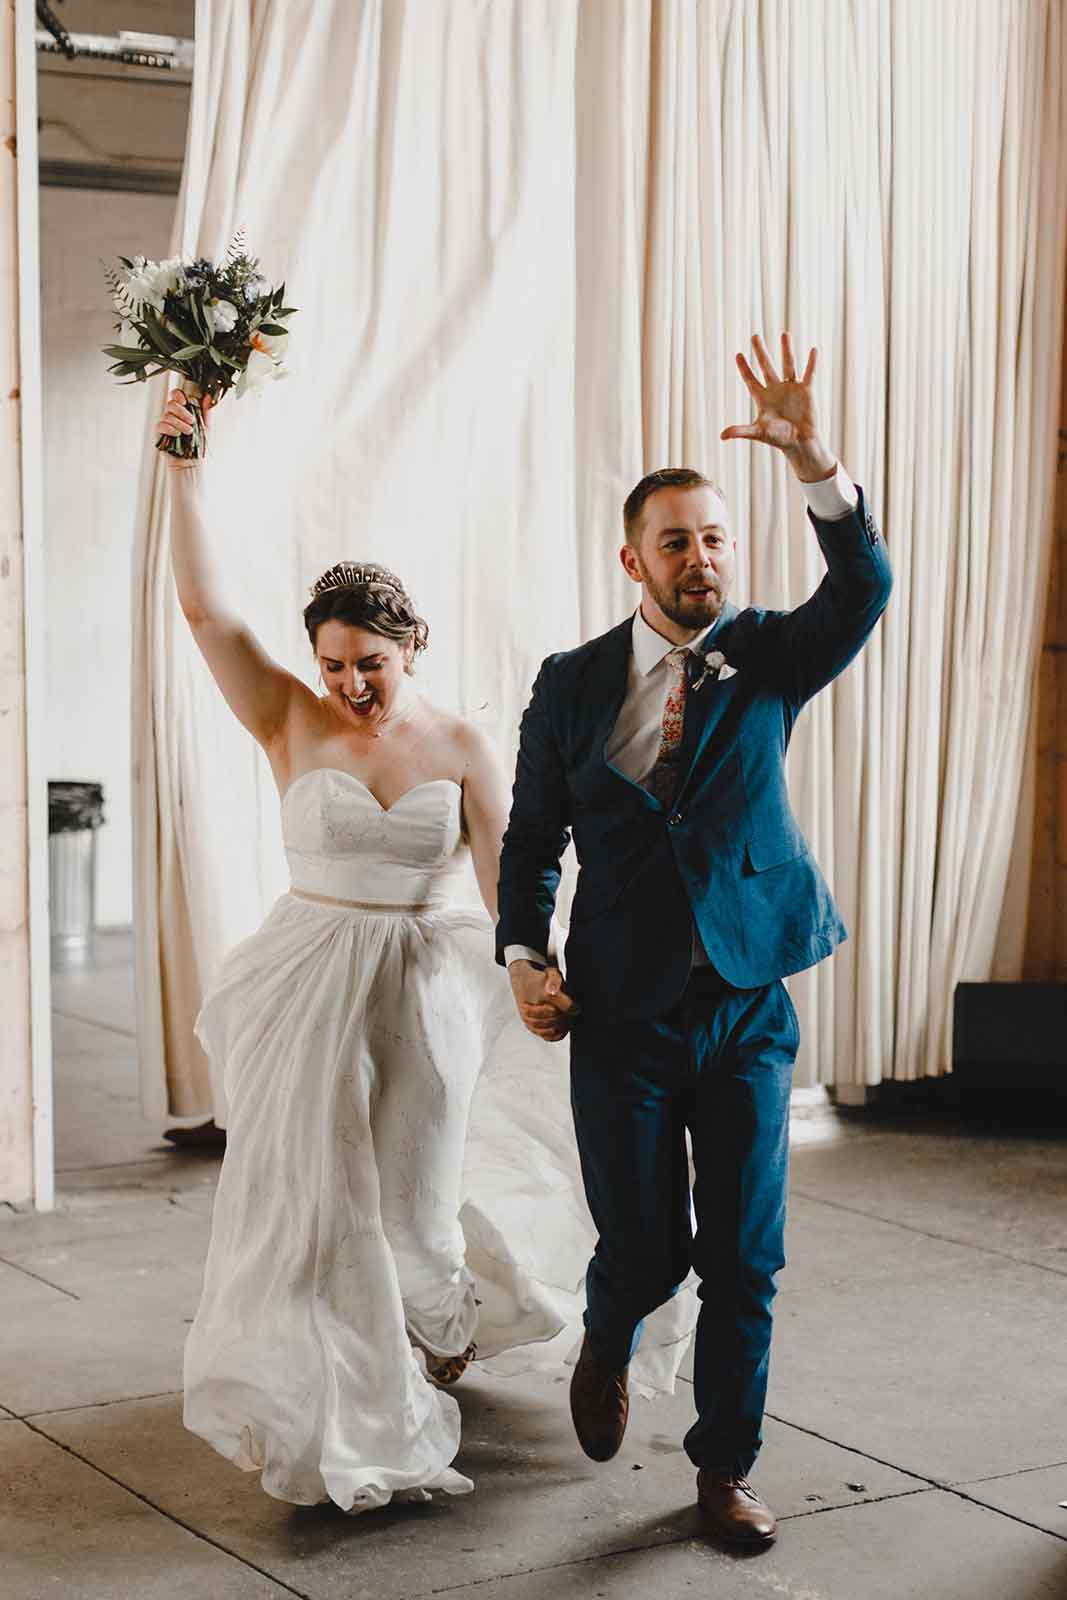 bok-wedding-philadelphia-sarah-rich-22.jpg